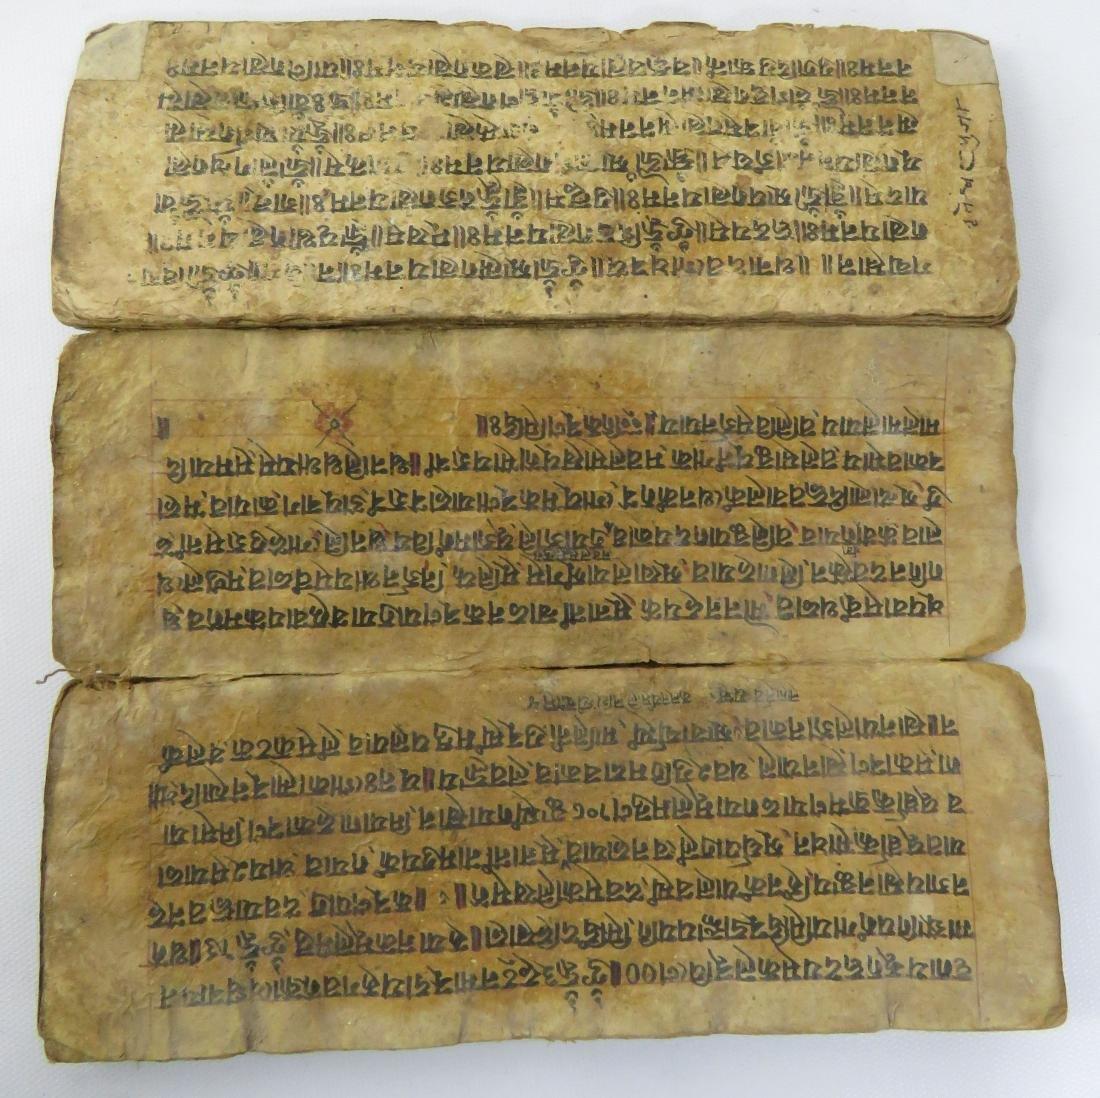 "TIBETAN BUDDHIST SUTRA, 19TH CENTURY. 3 1/2 X 11"""